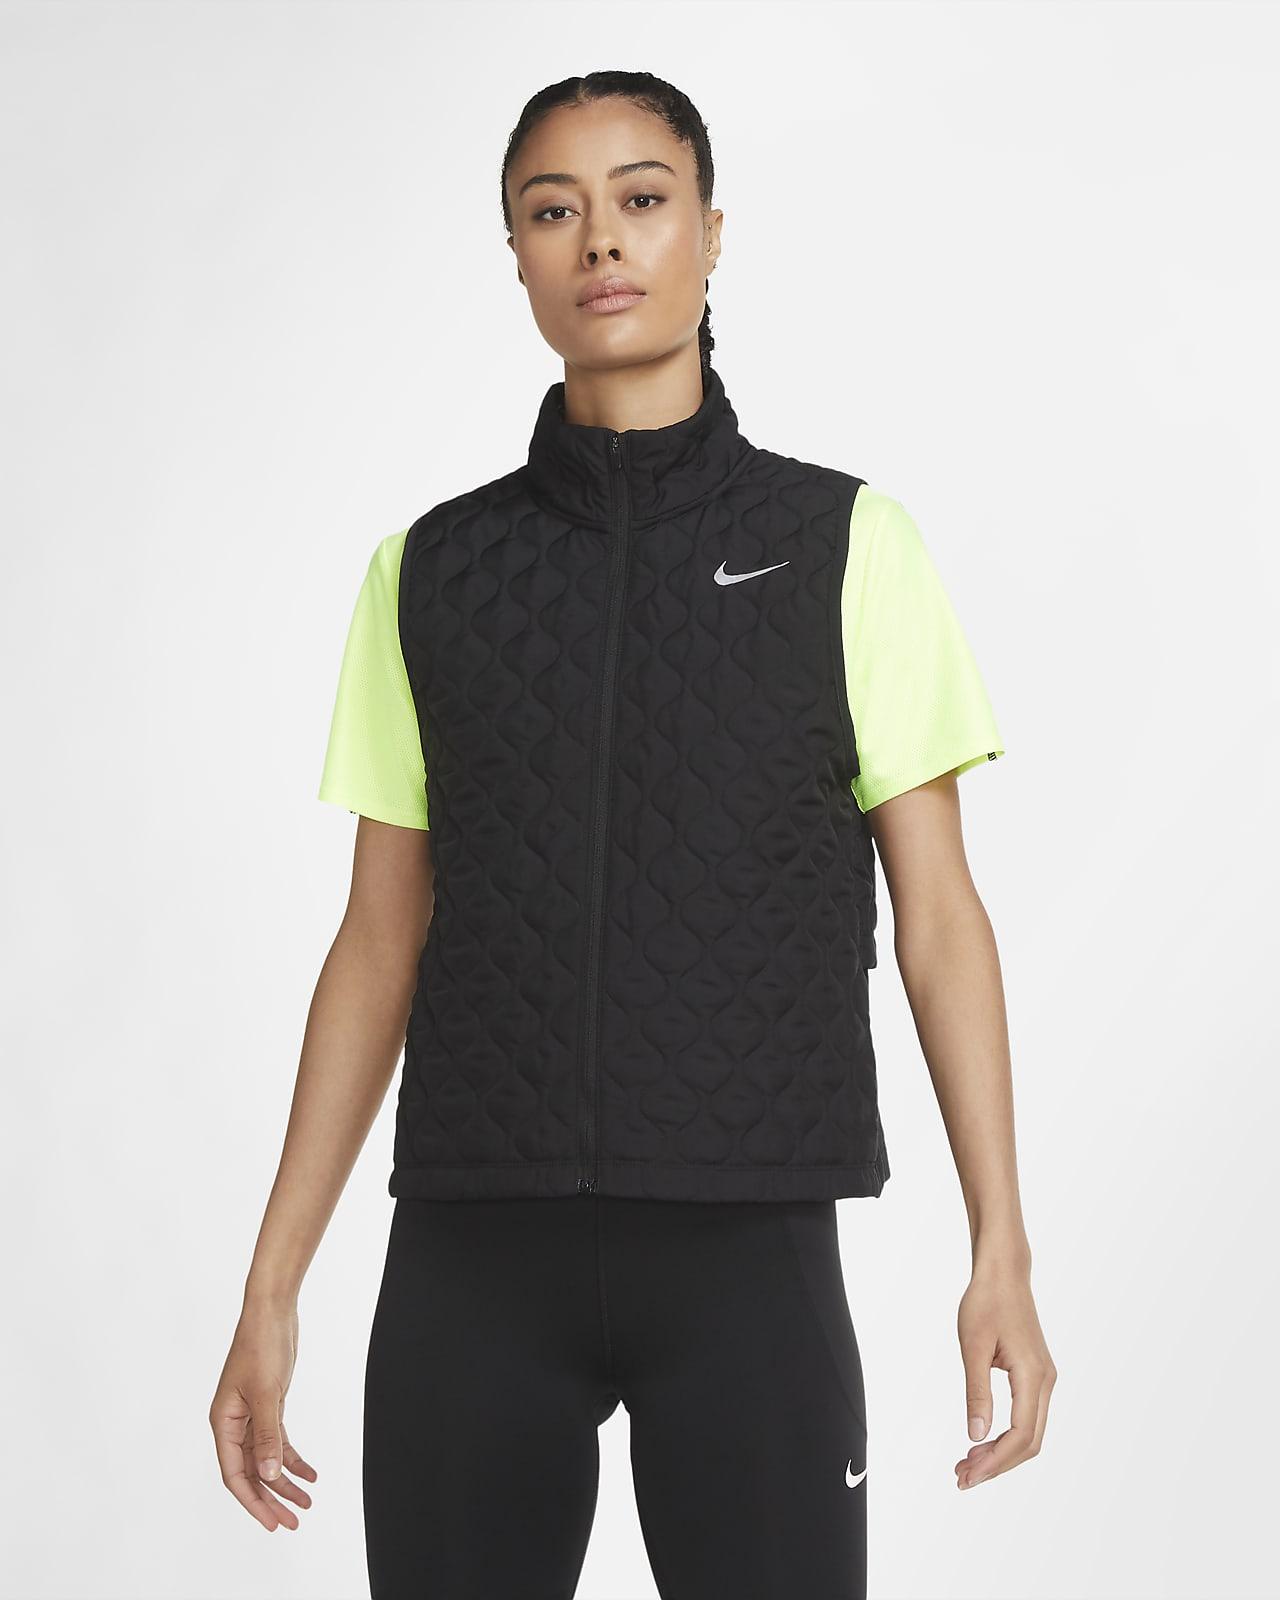 Nike Aerolayer løpevest til dame